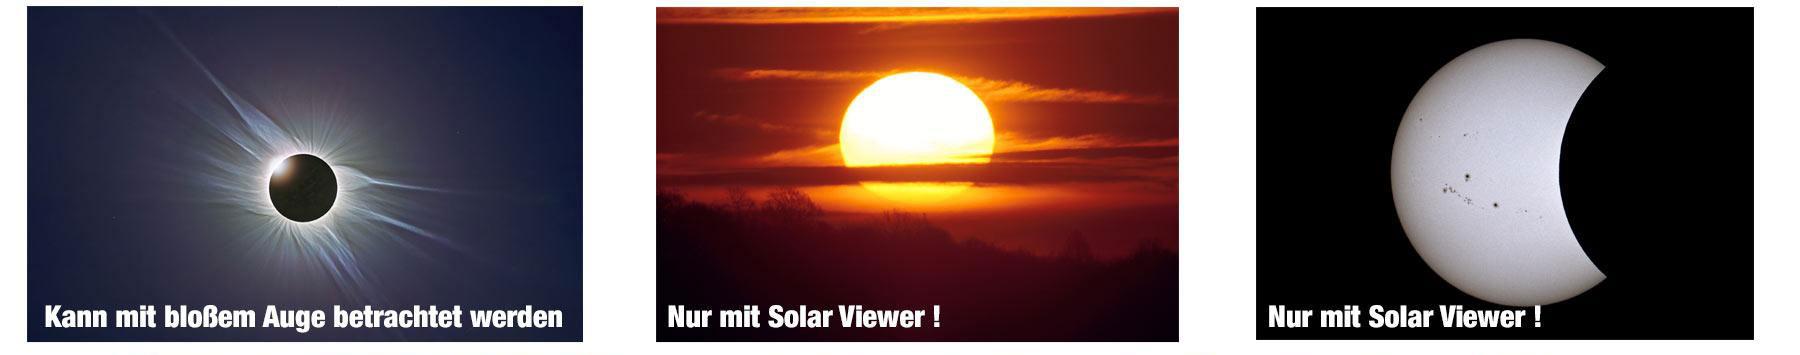 optik fachhandel in stuttgart baader solar viewer silver gold 25 st online kaufen bei. Black Bedroom Furniture Sets. Home Design Ideas